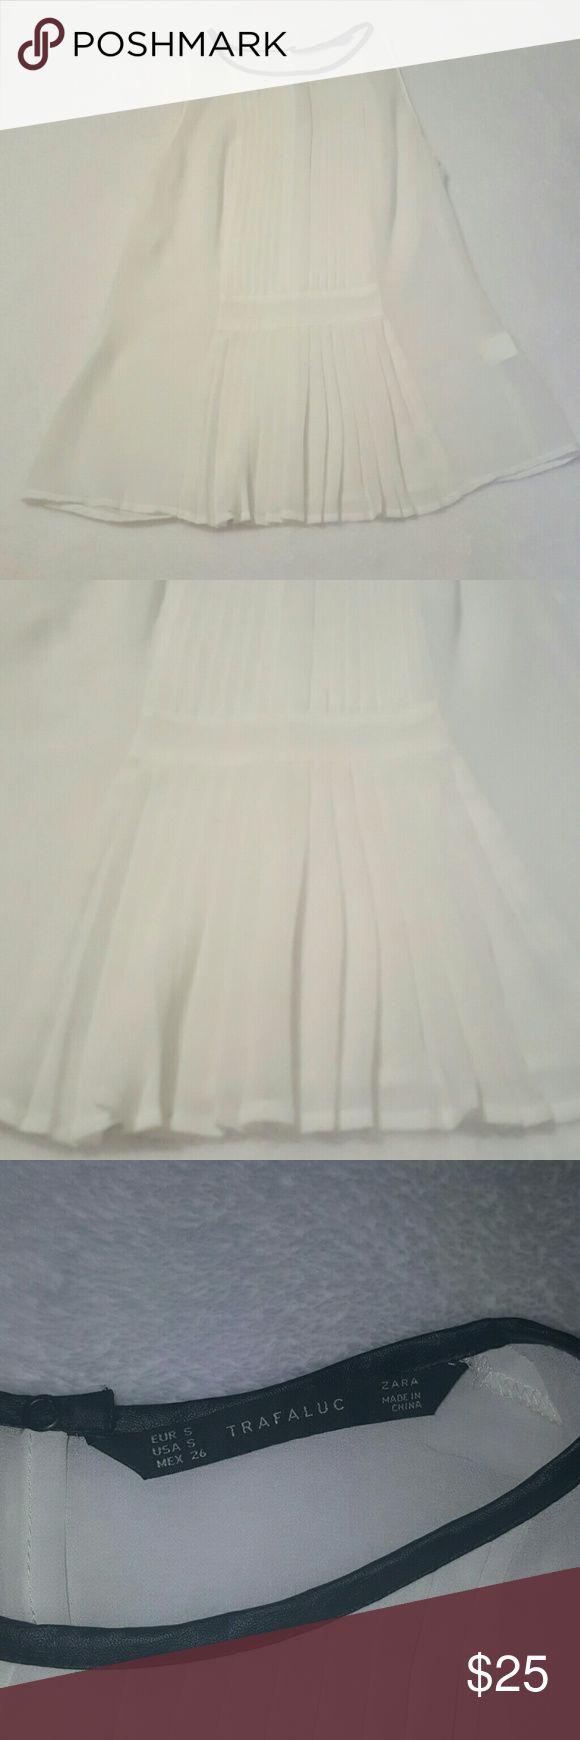 ZARA top Delicate, almost sheer top in white. Trafaluc collection. ZARA Tops Blouses